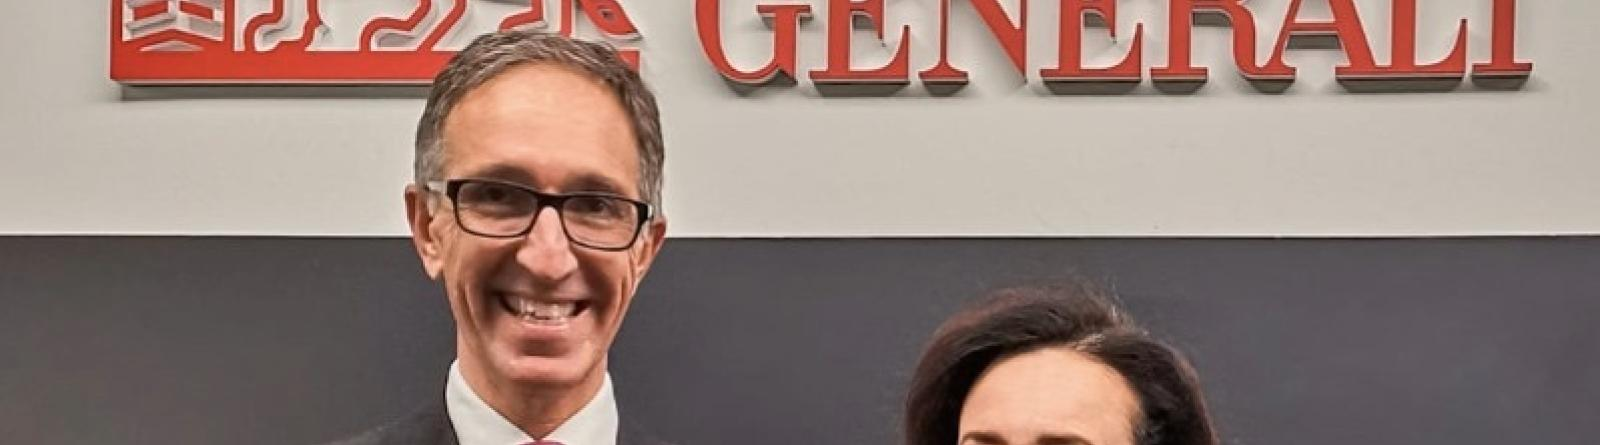 Banca Generali vince gli Italian certificate awards